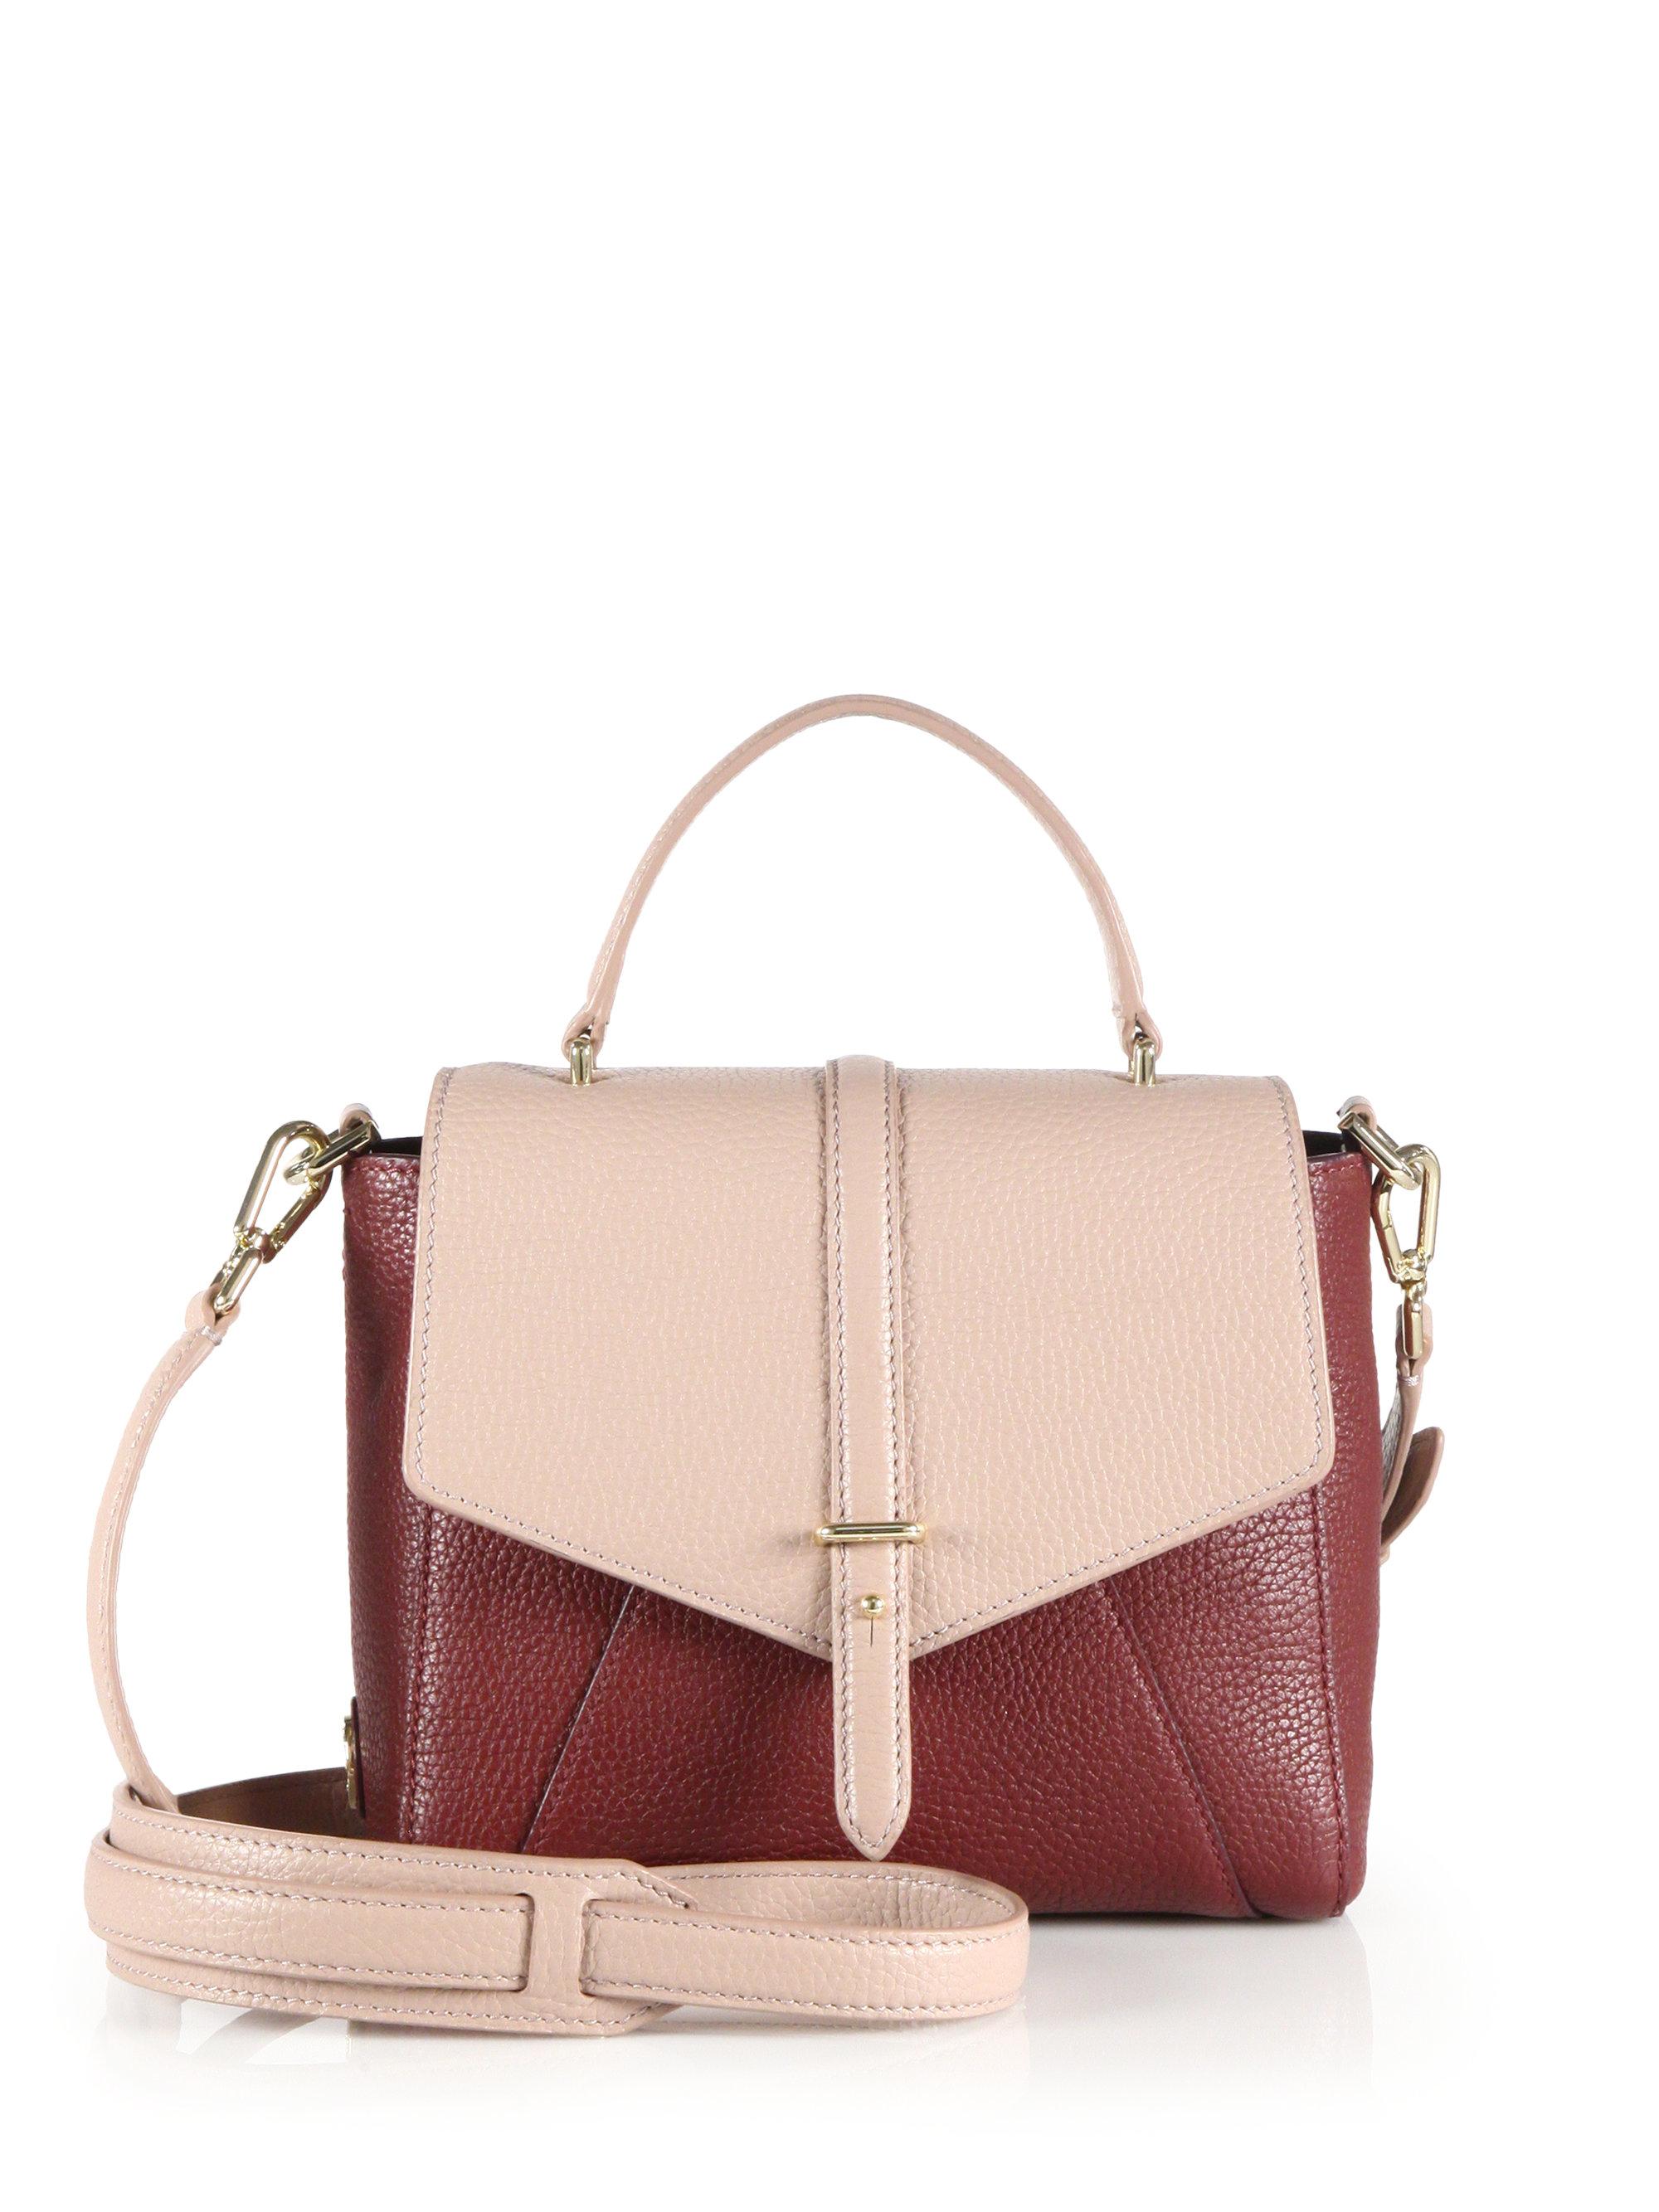 e95980f6590c Lyst - Tory Burch 797 Mini Leather Satchel in Pink